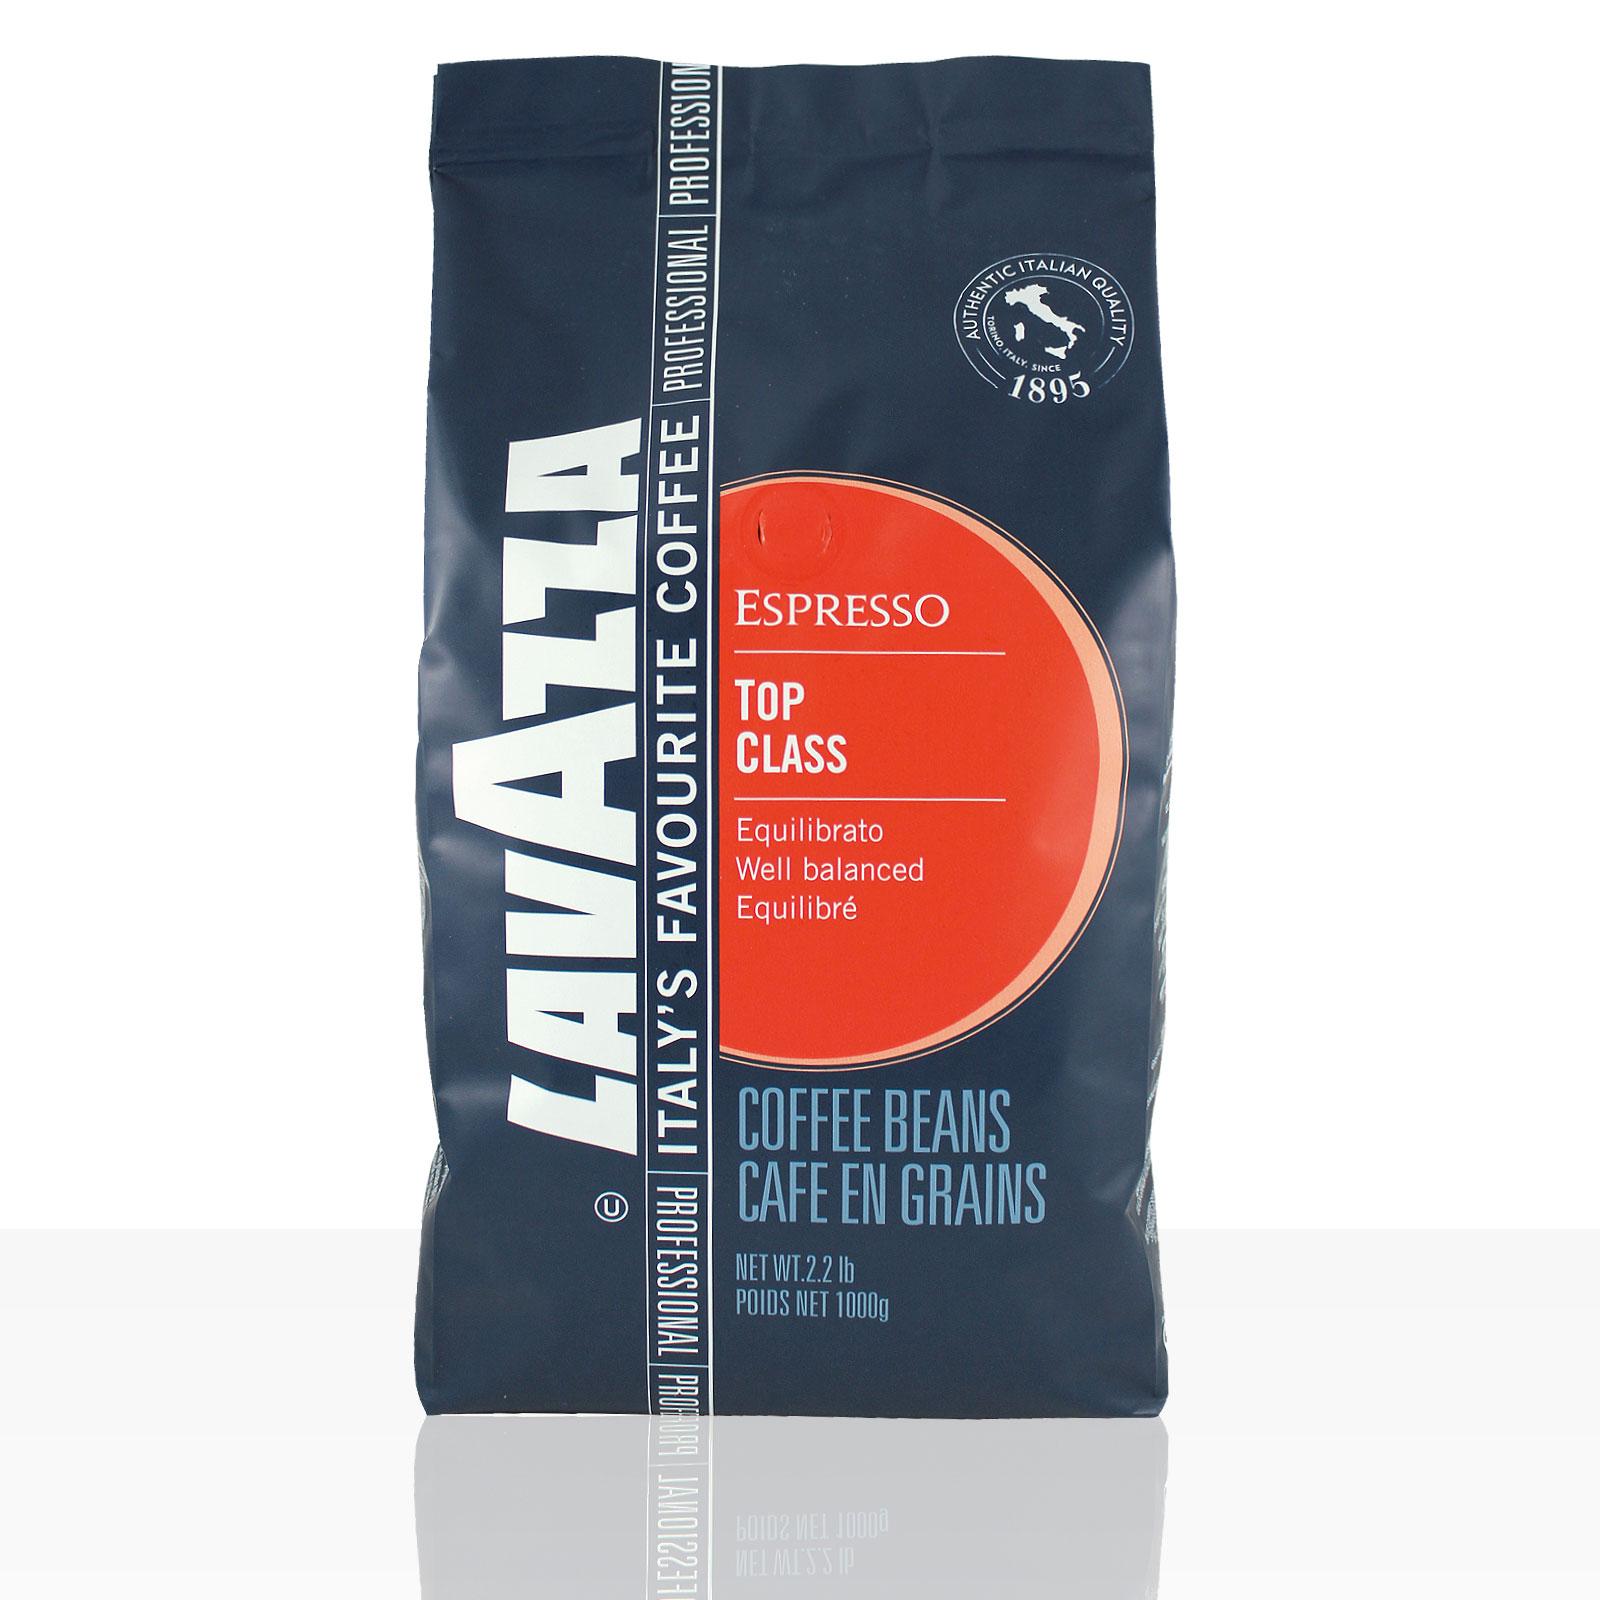 Lavazza Espresso Top Class - 6 x 1kg ganze Kaffee-Bohne